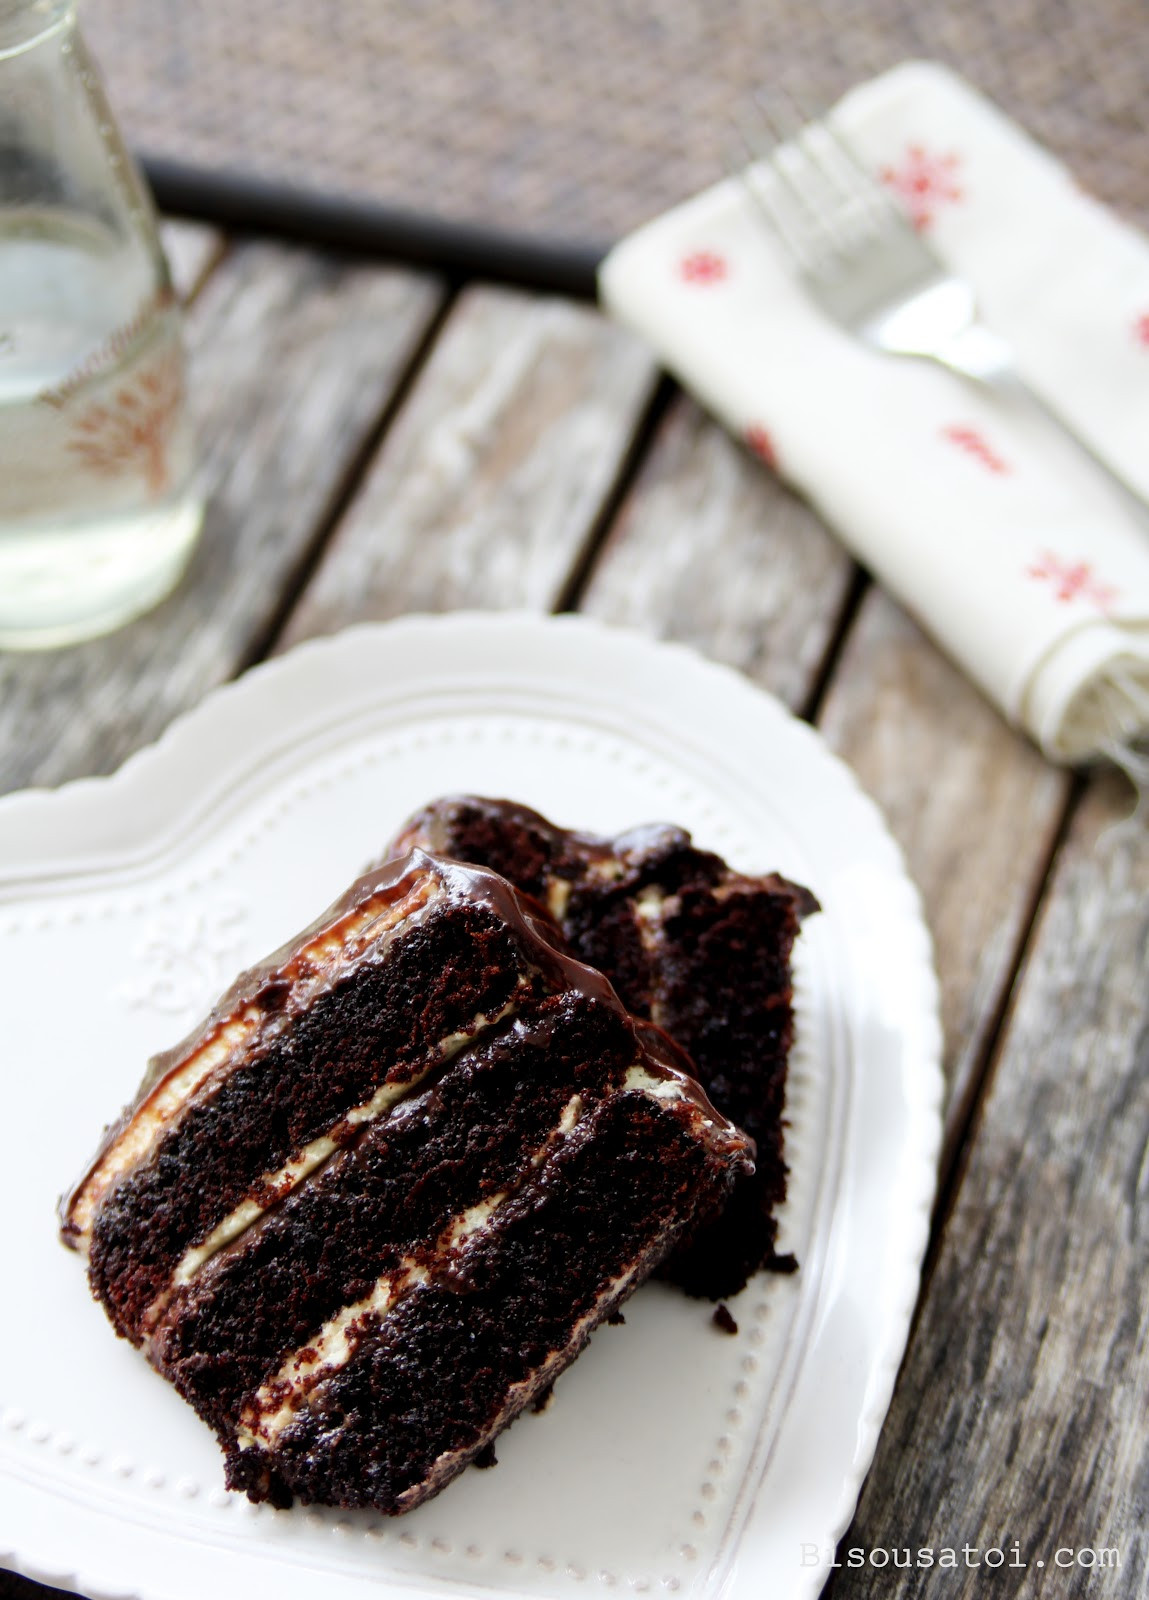 Salted Caramel Chocolate Cake  Salted Caramel Chocolate Cake Bisous À Toi